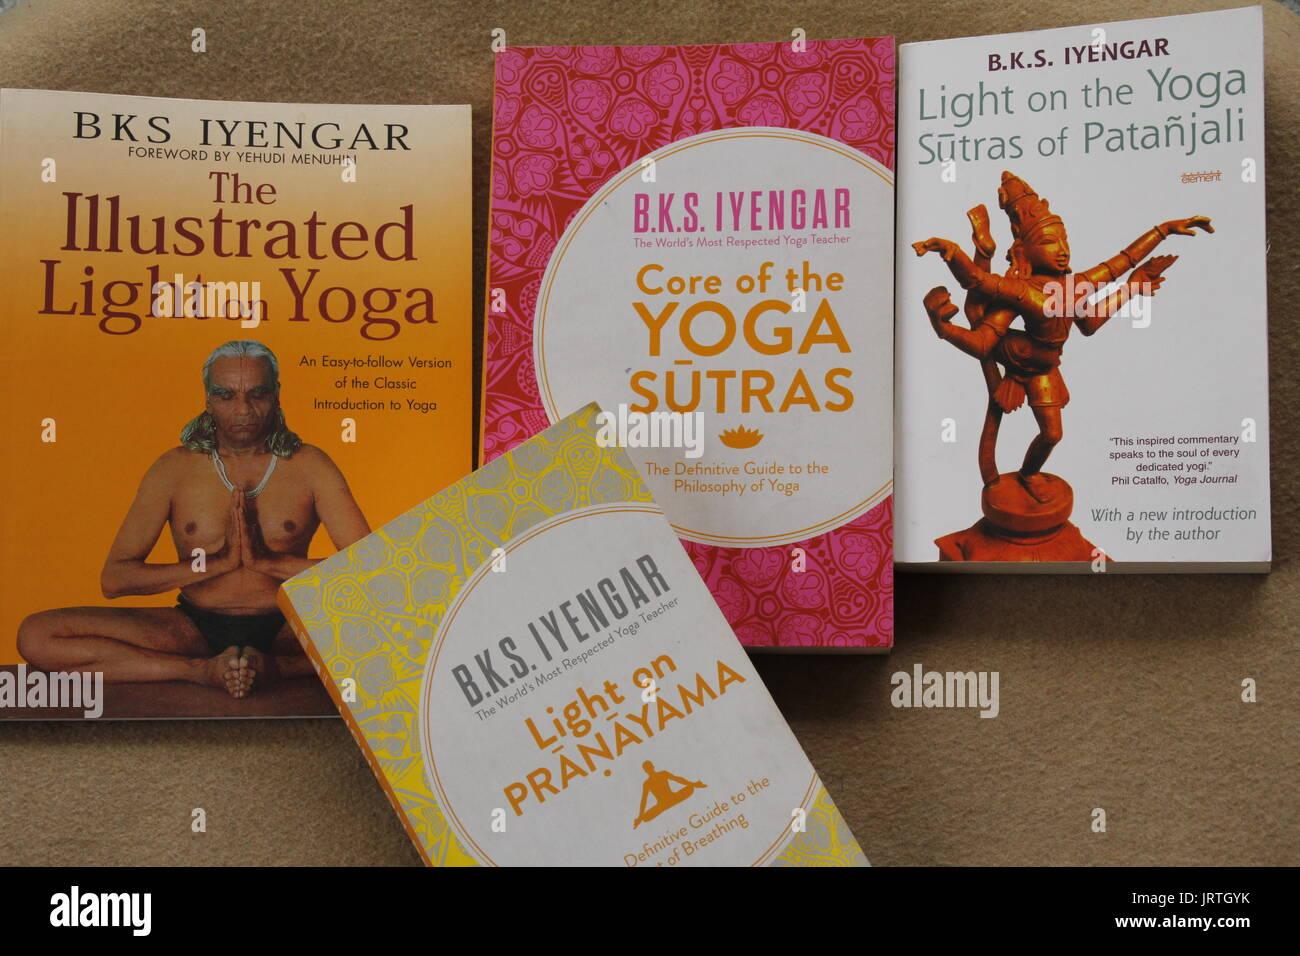 Yoga related books by late Shri B K S Iyengar, the founder of Iyengar Yoga - Stock Image